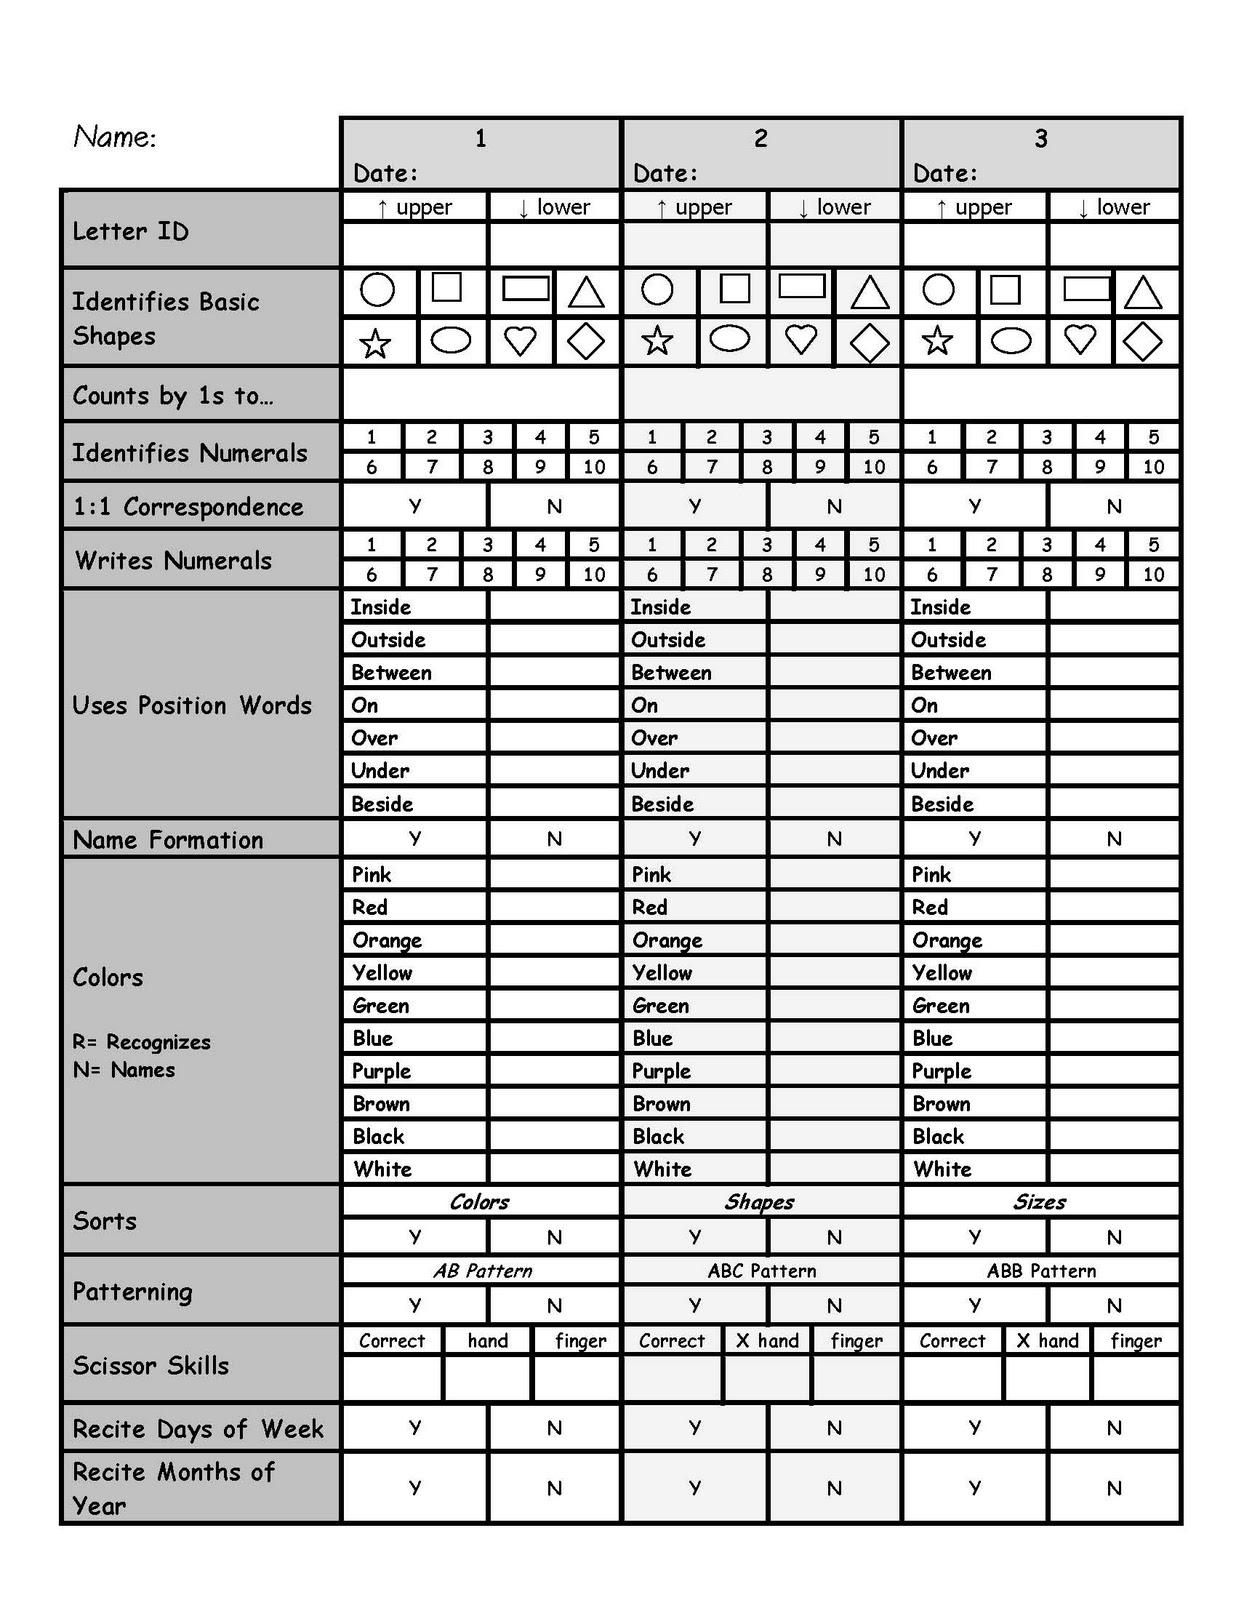 Downloaded--Assessment-Great For Power Standardsinteresting Idea - Free Printable Pre K Assessment Forms